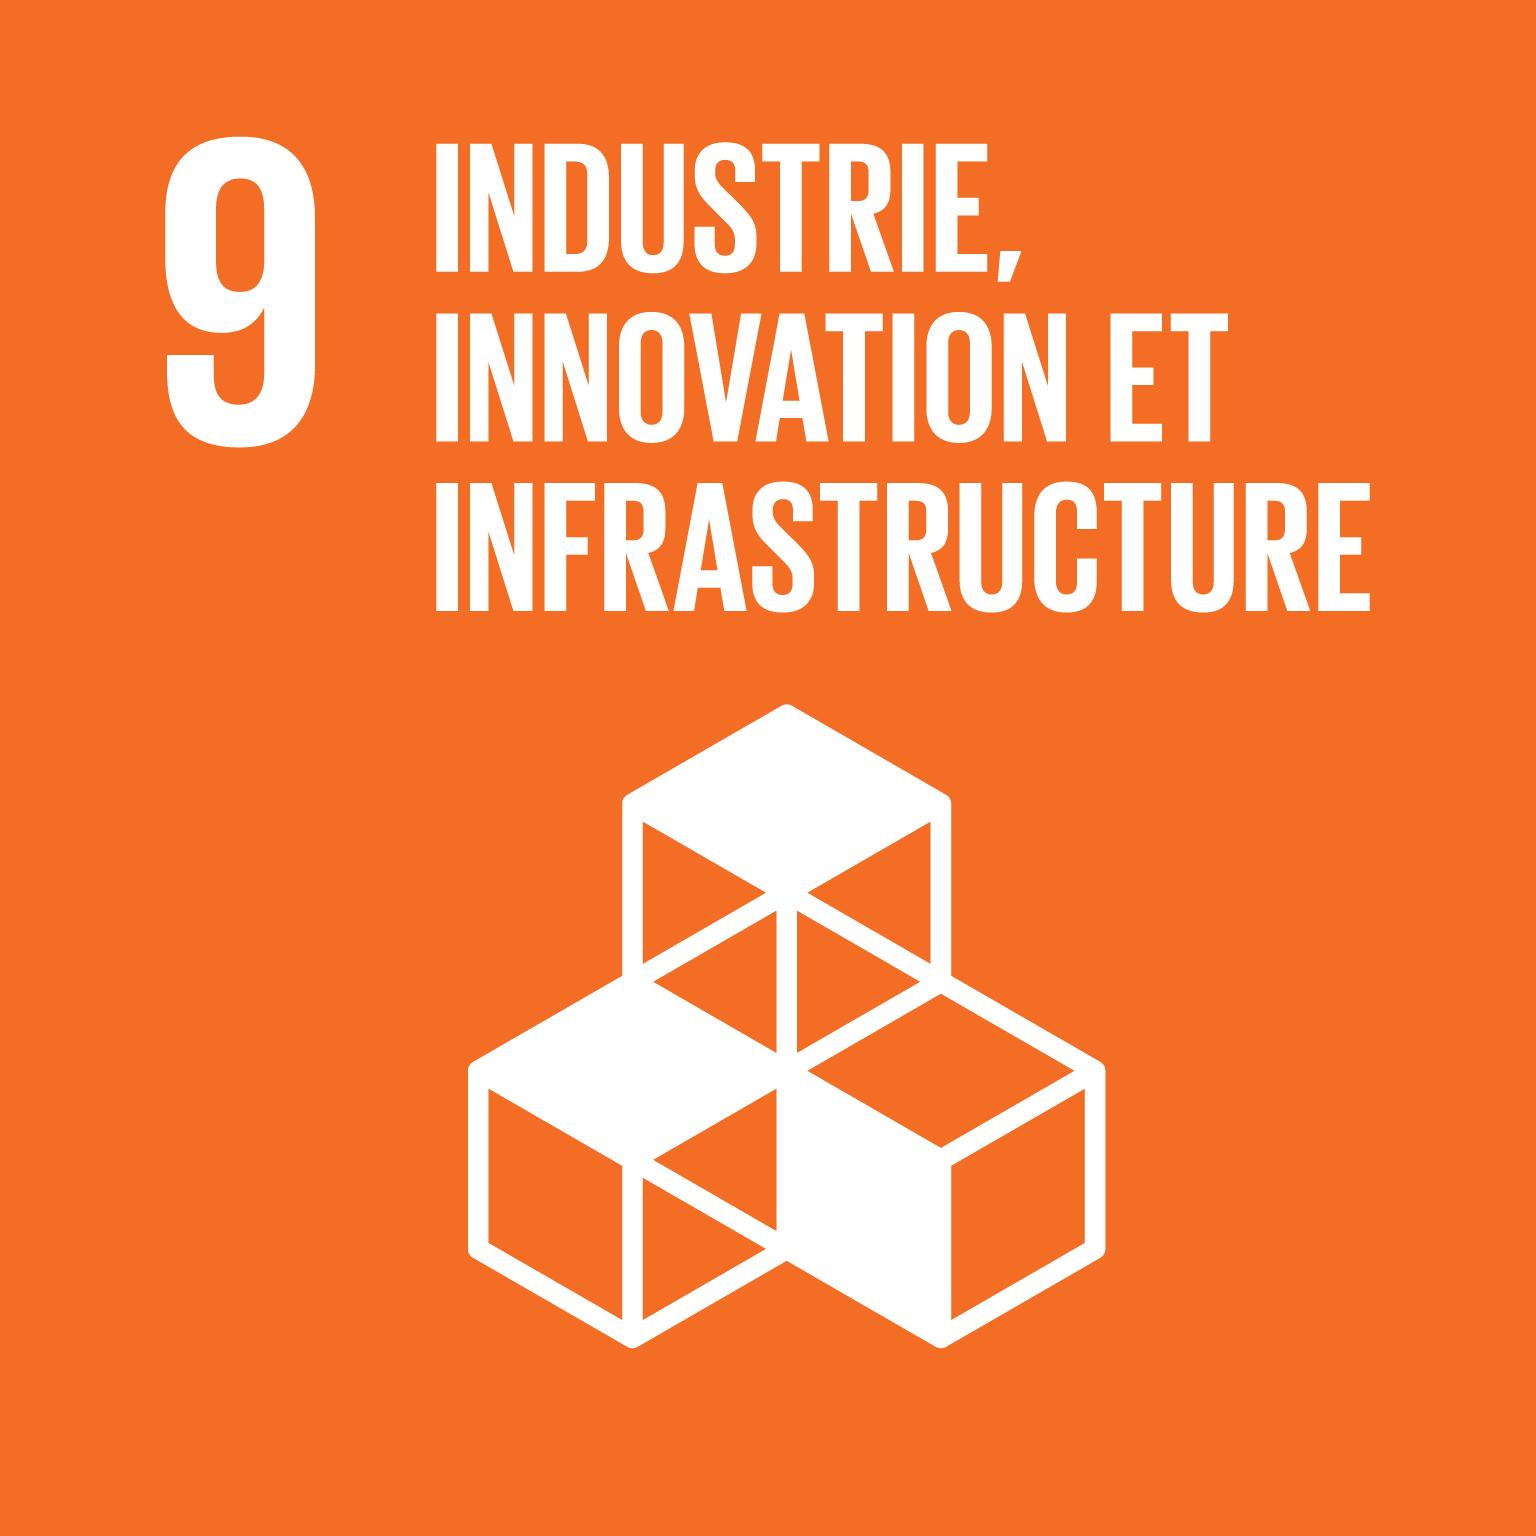 ODD Industrie innovation et infrastructure